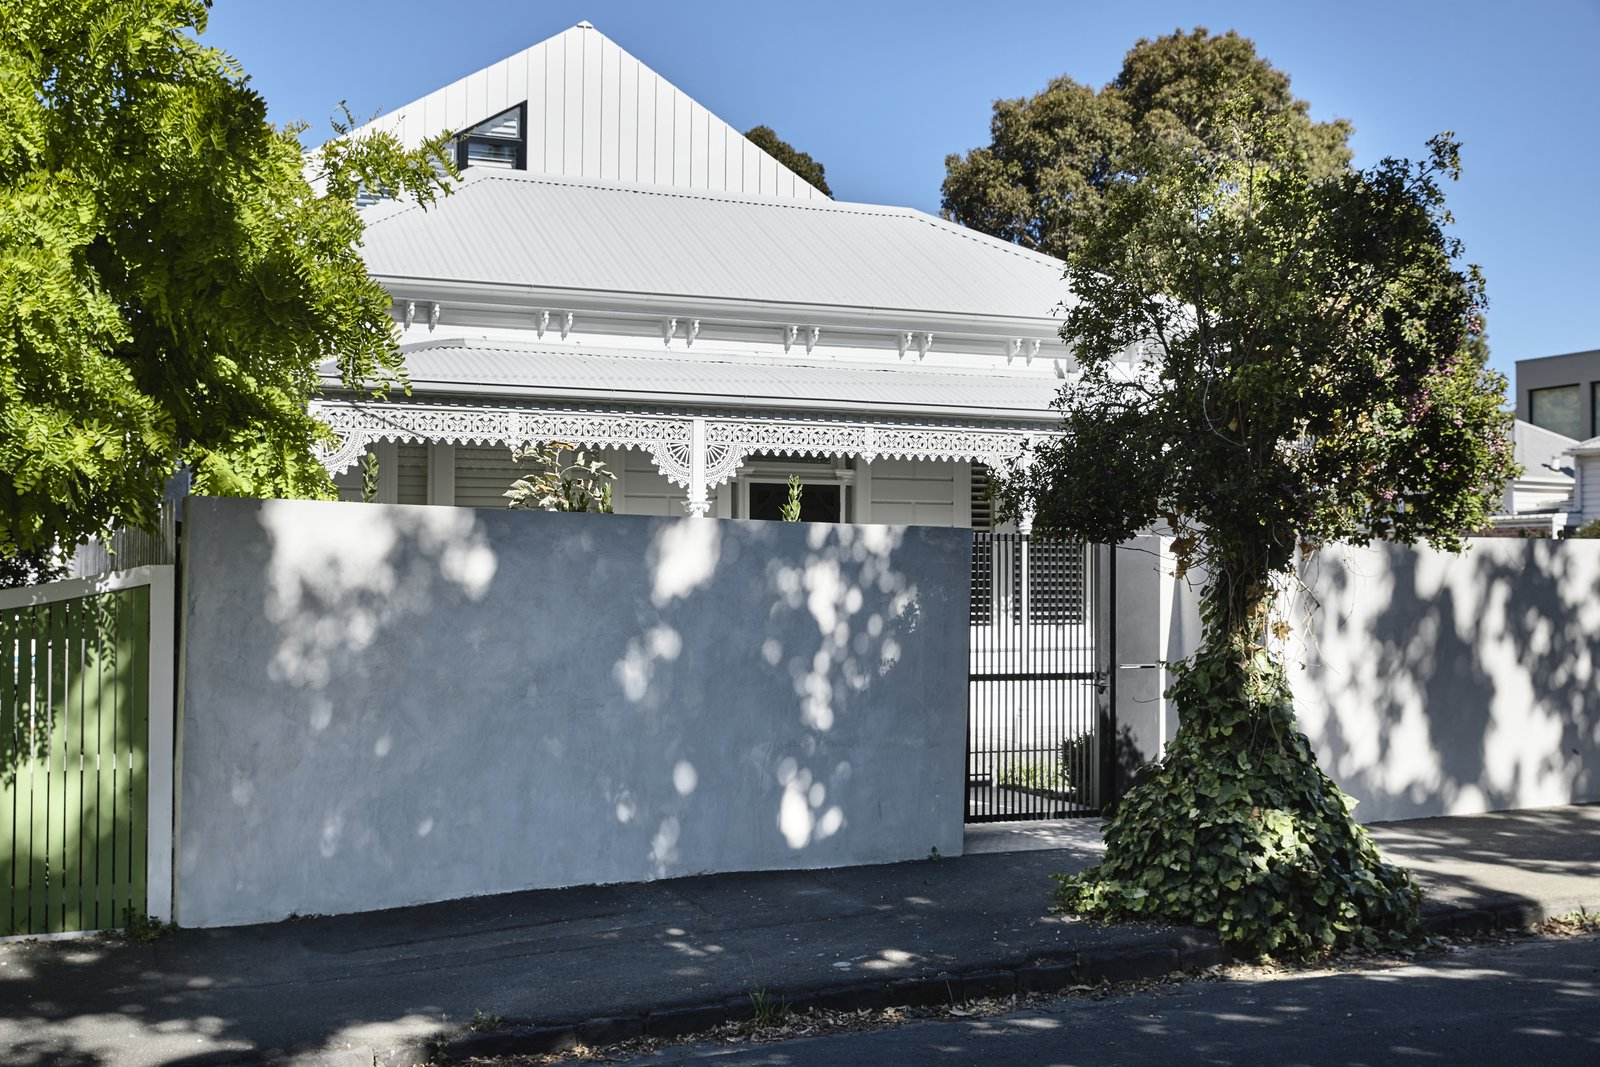 Scandizzo House, Kennon+ Victorian cottage house facade decorative filigree